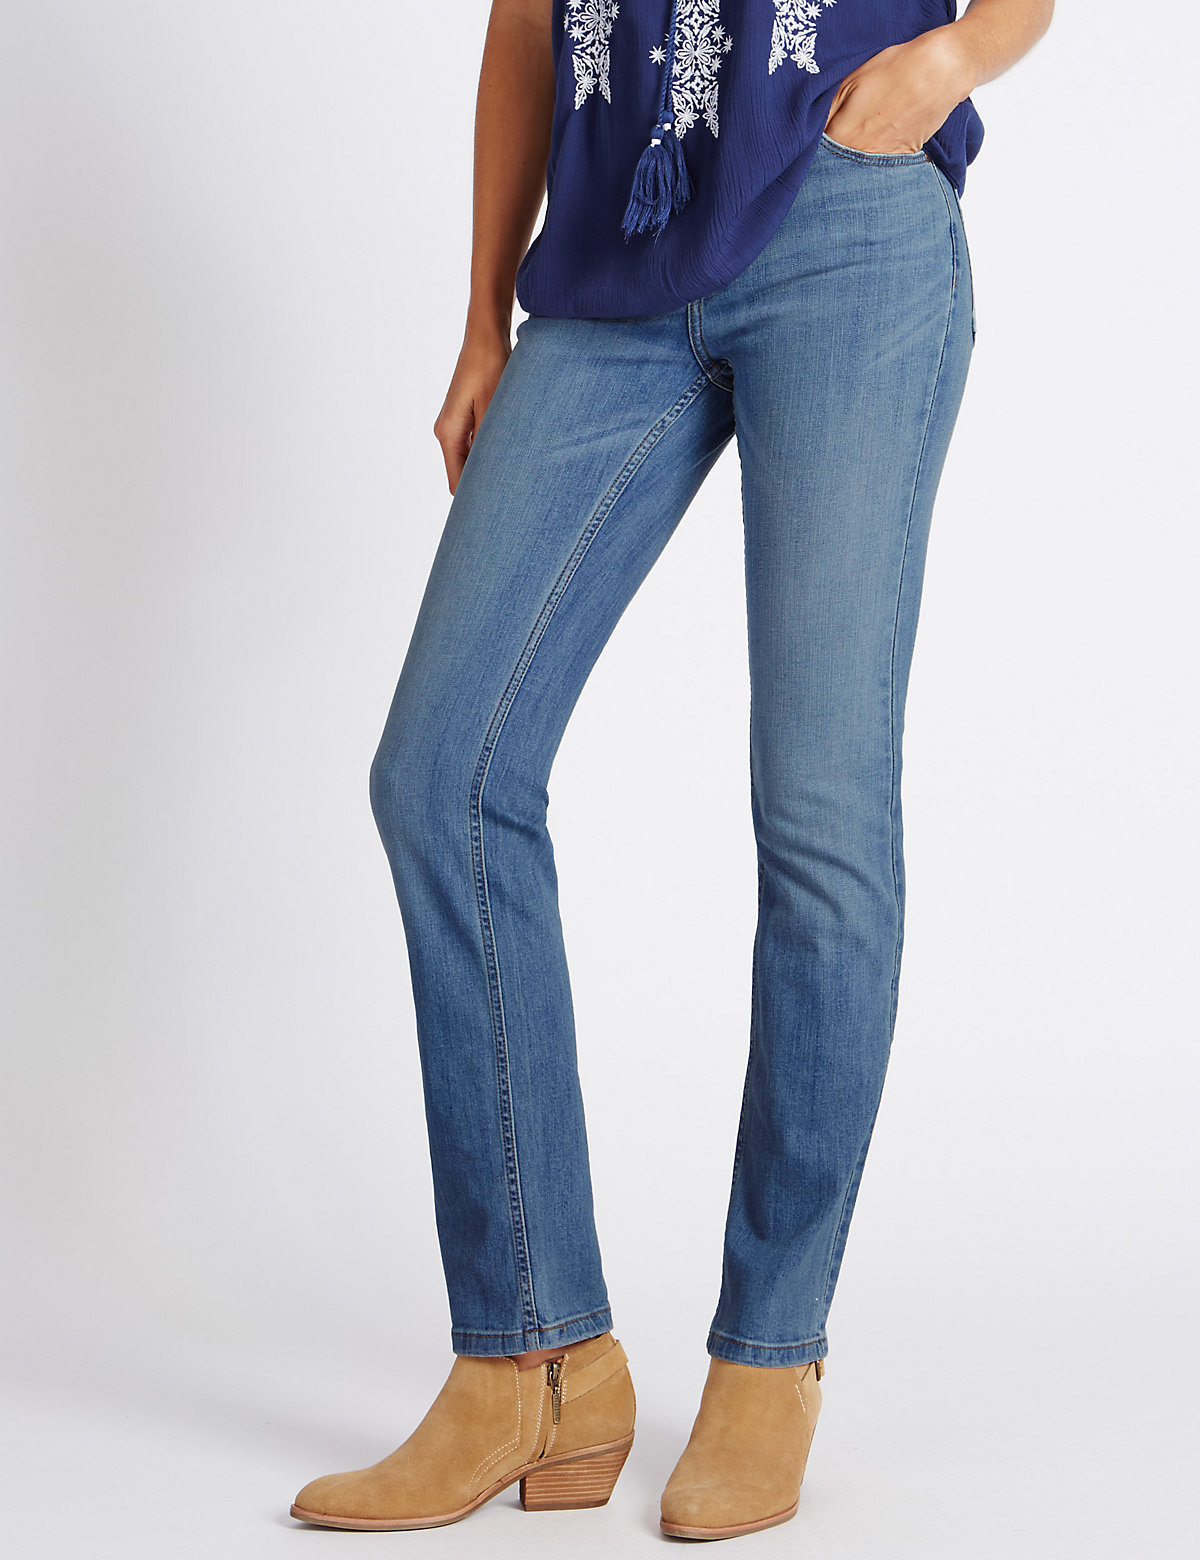 Indigo Collection Mid Rise Straight Leg Jeans